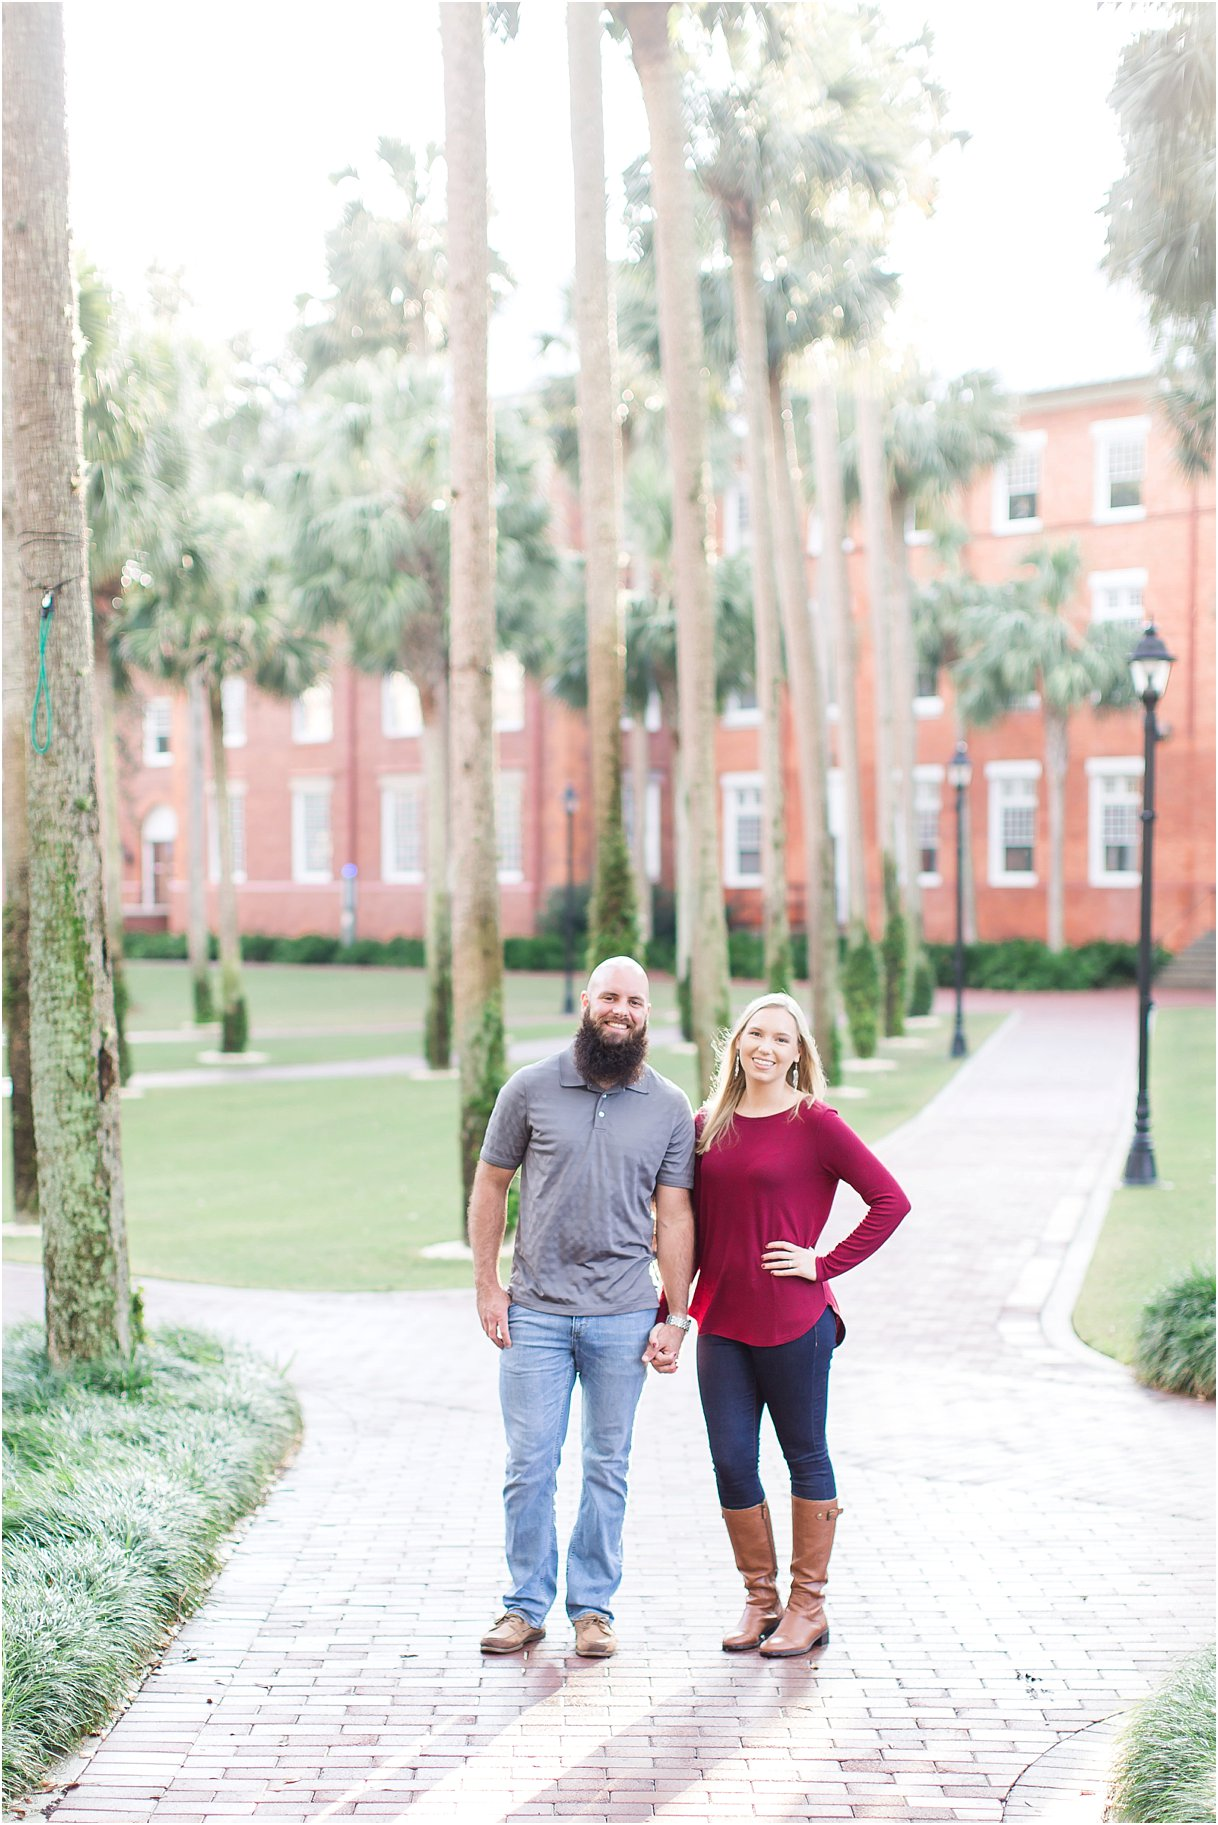 Stetson Florida Engagement Session Tampa St Augustine DeLand17.jpg